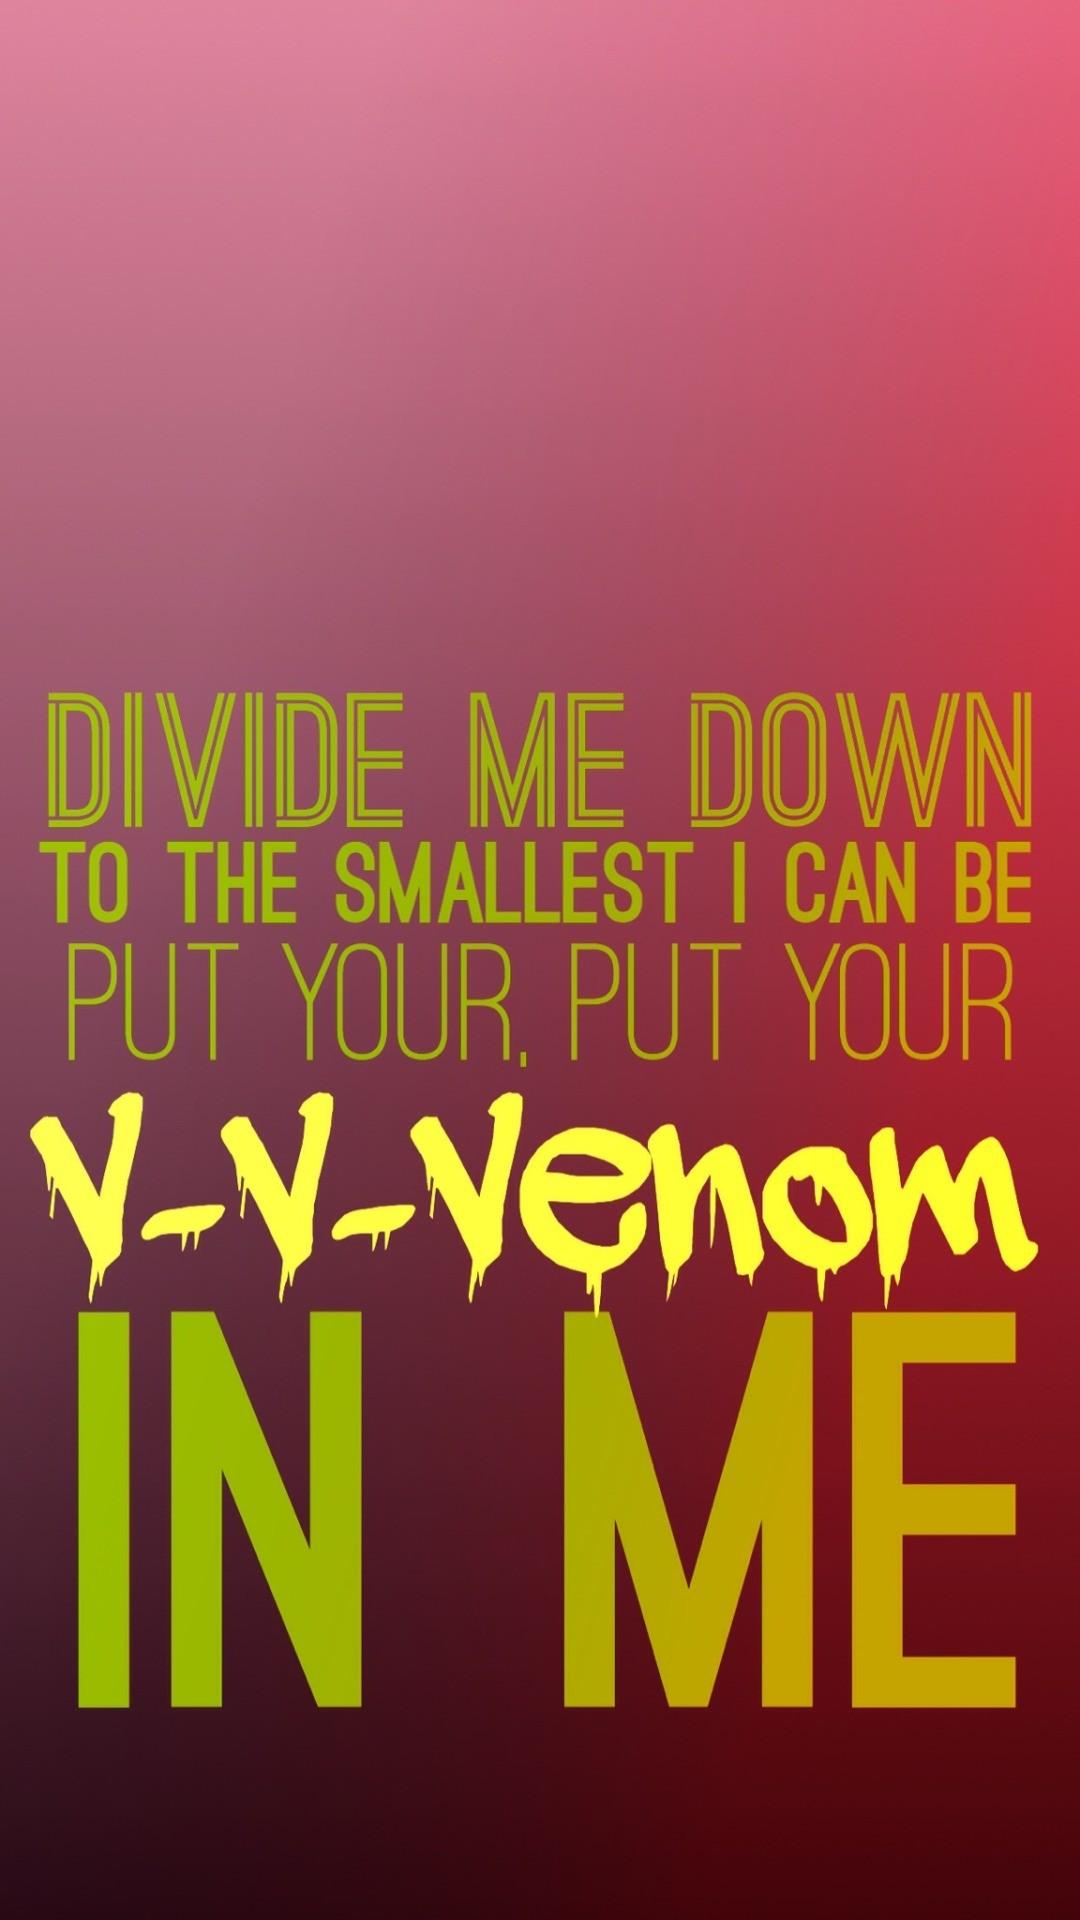 Fall Out Boy Lyrics Wallpaper Part 1